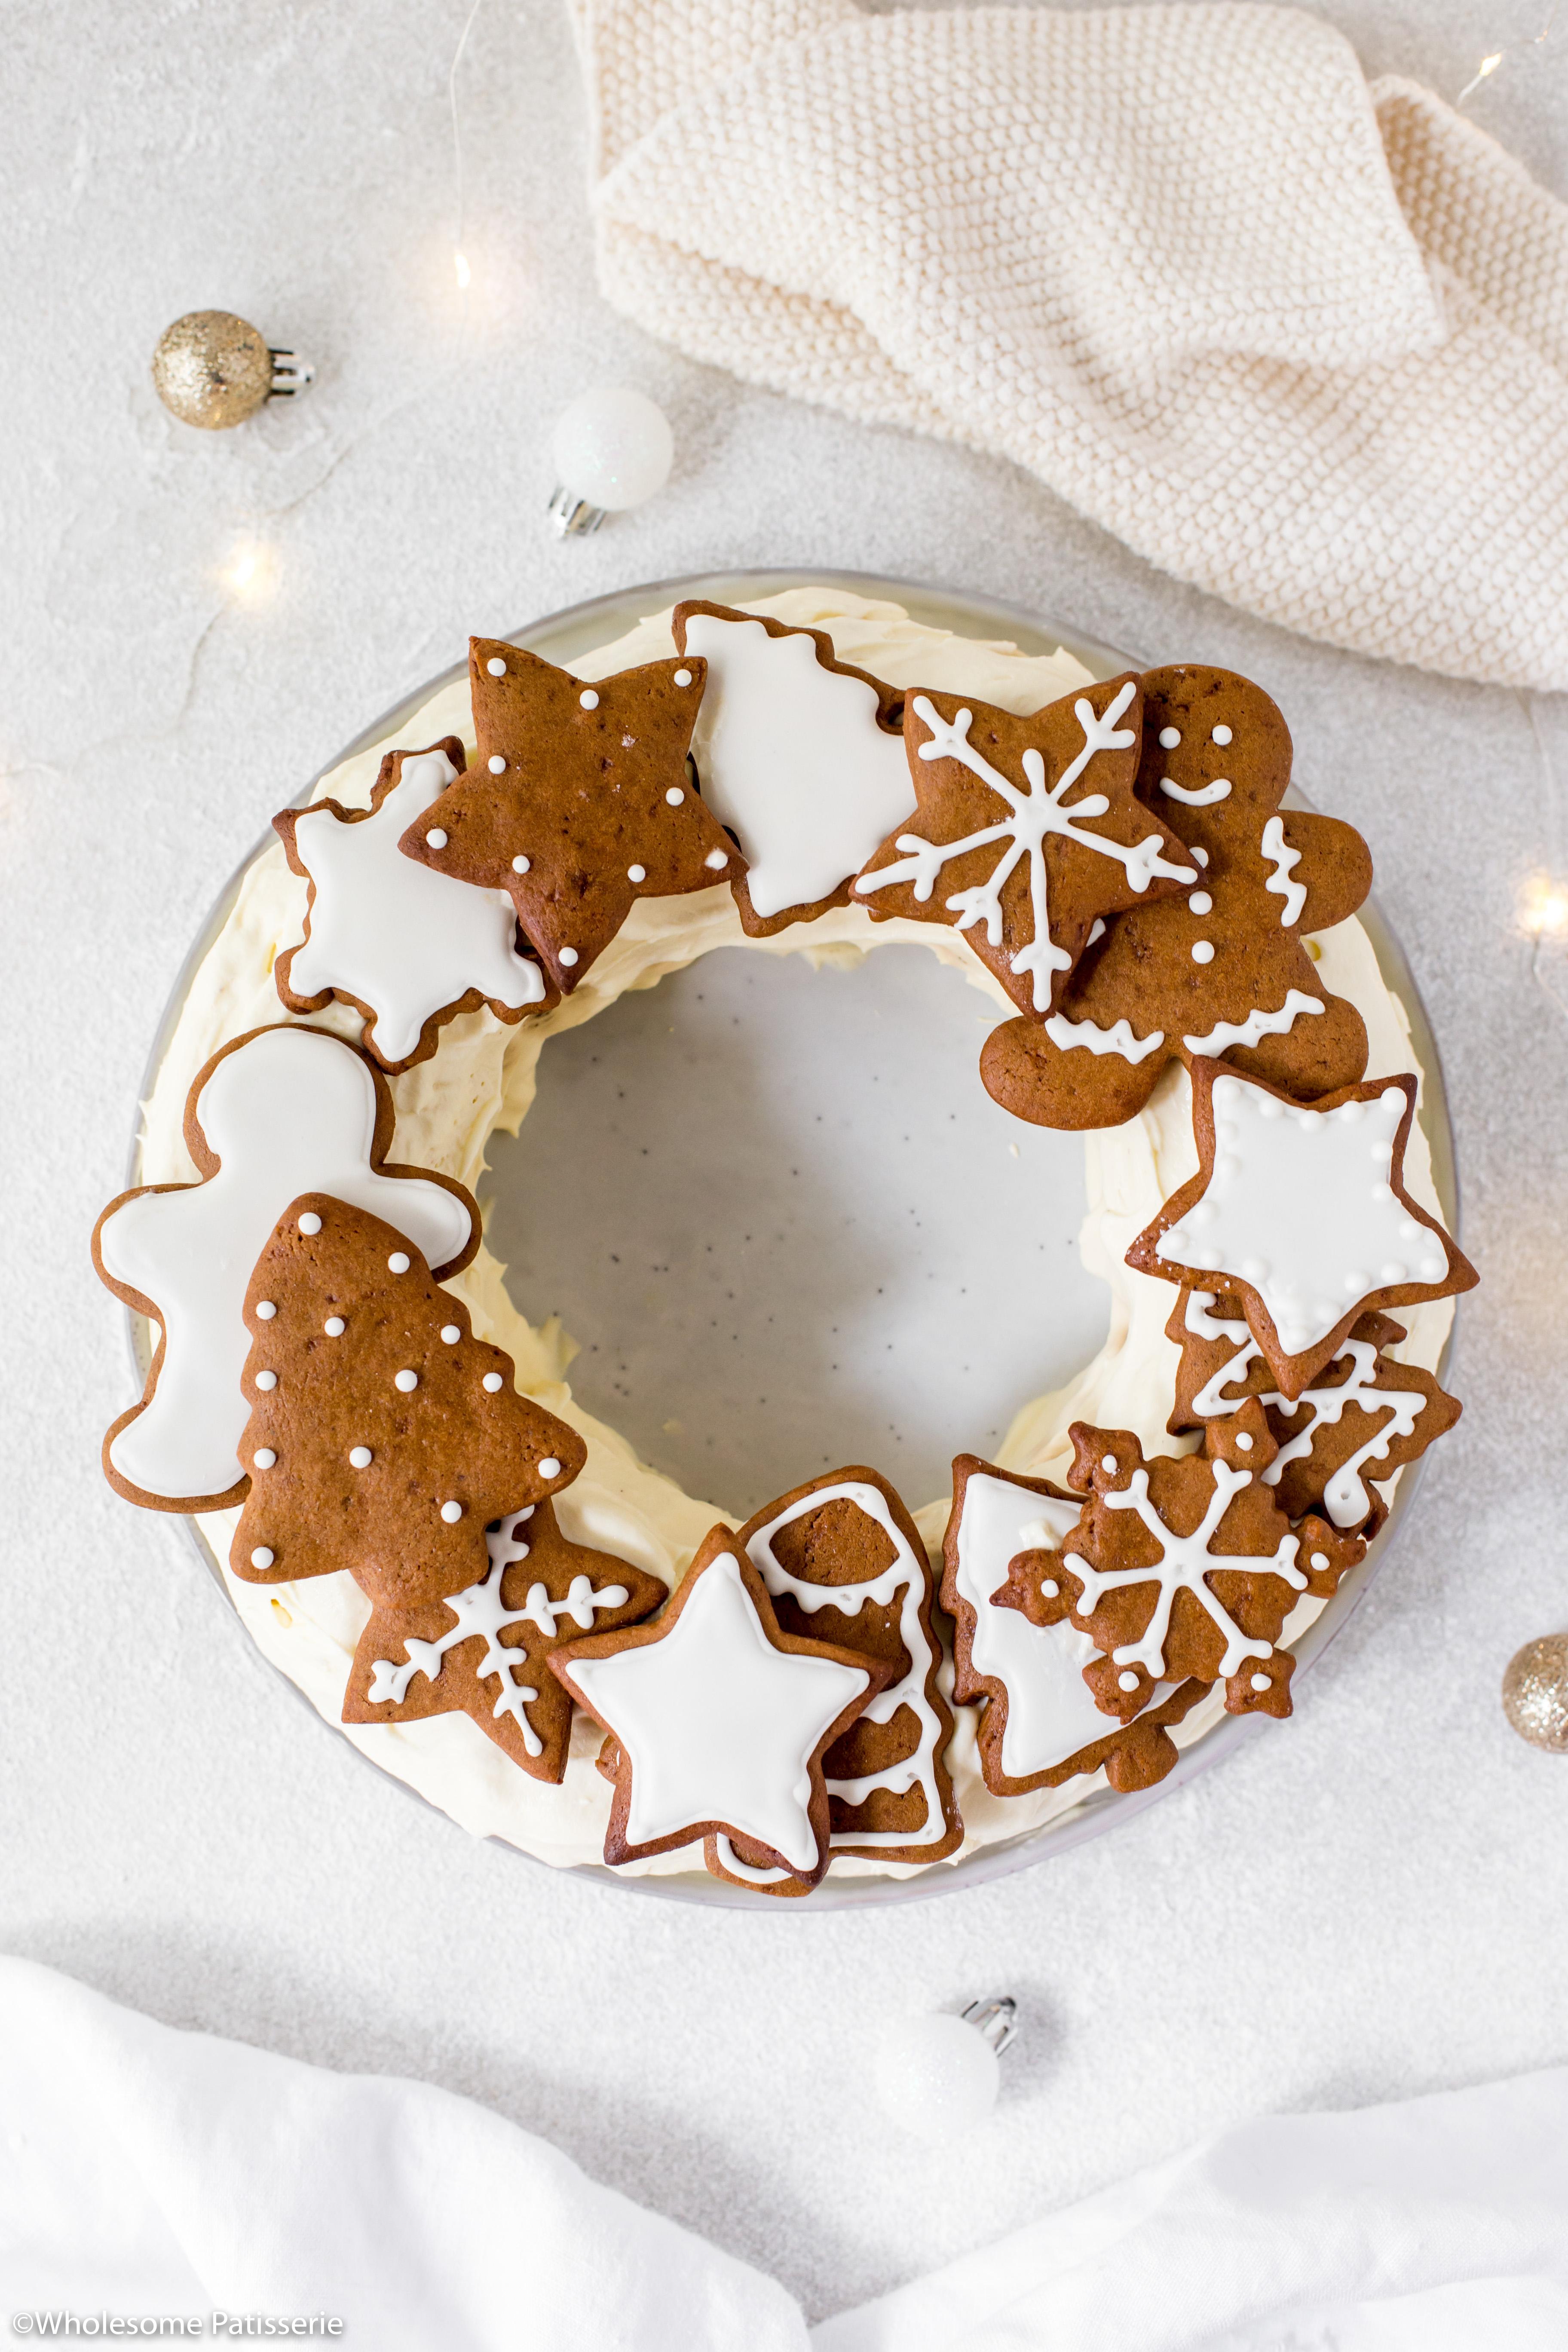 Chocolate Ripple Wreath Cake with Brandy Cream